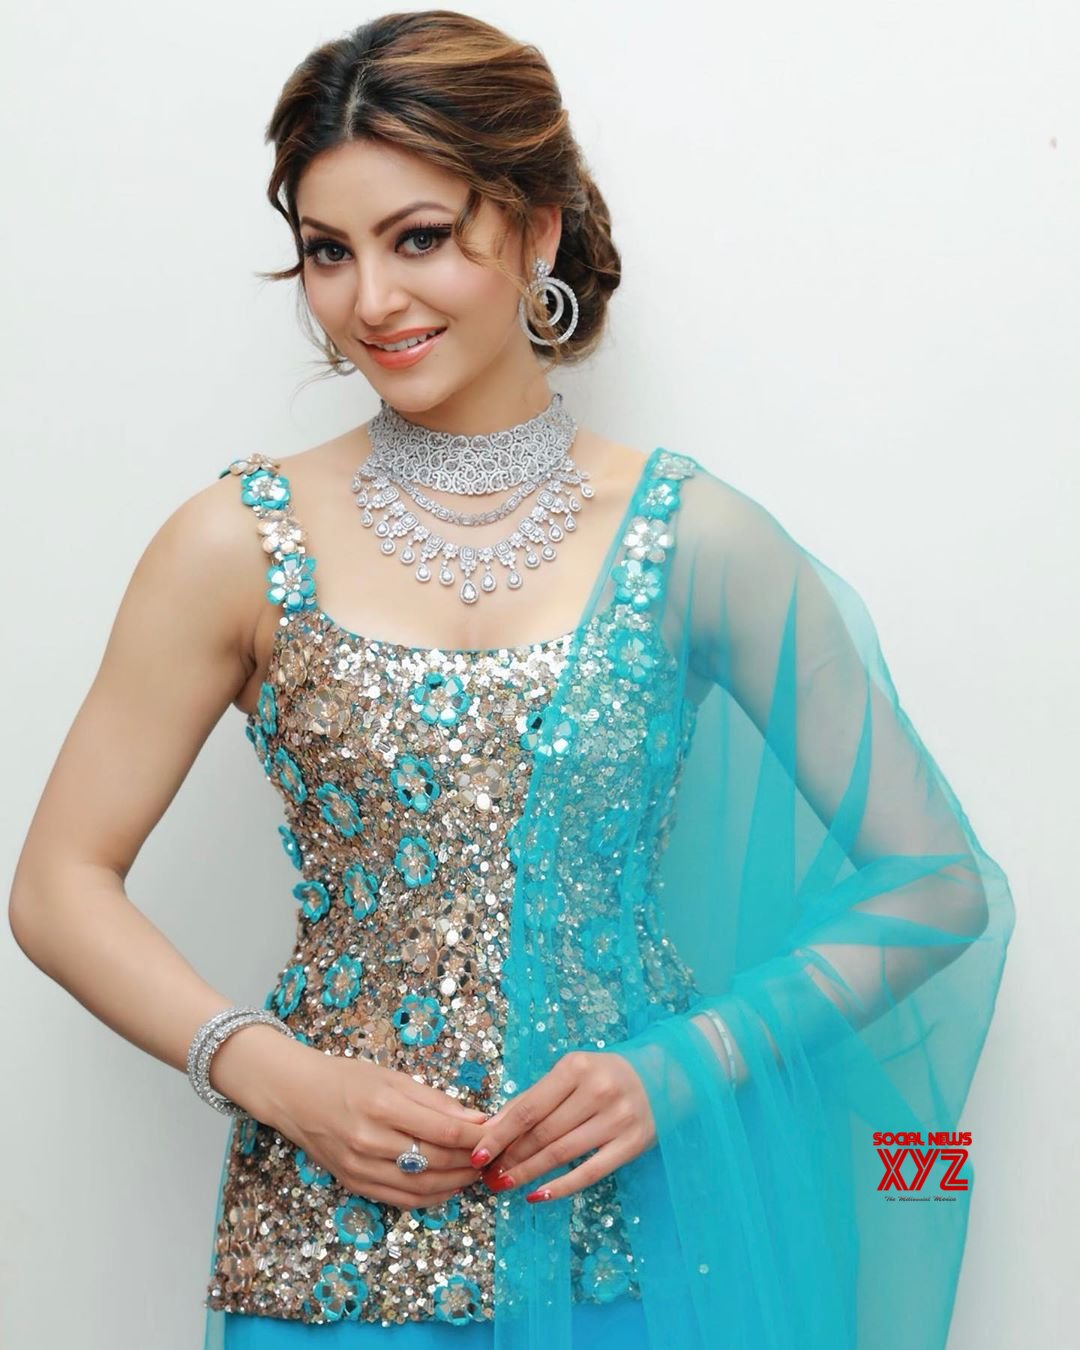 Actress Urvashi Rautela beautiful new stills